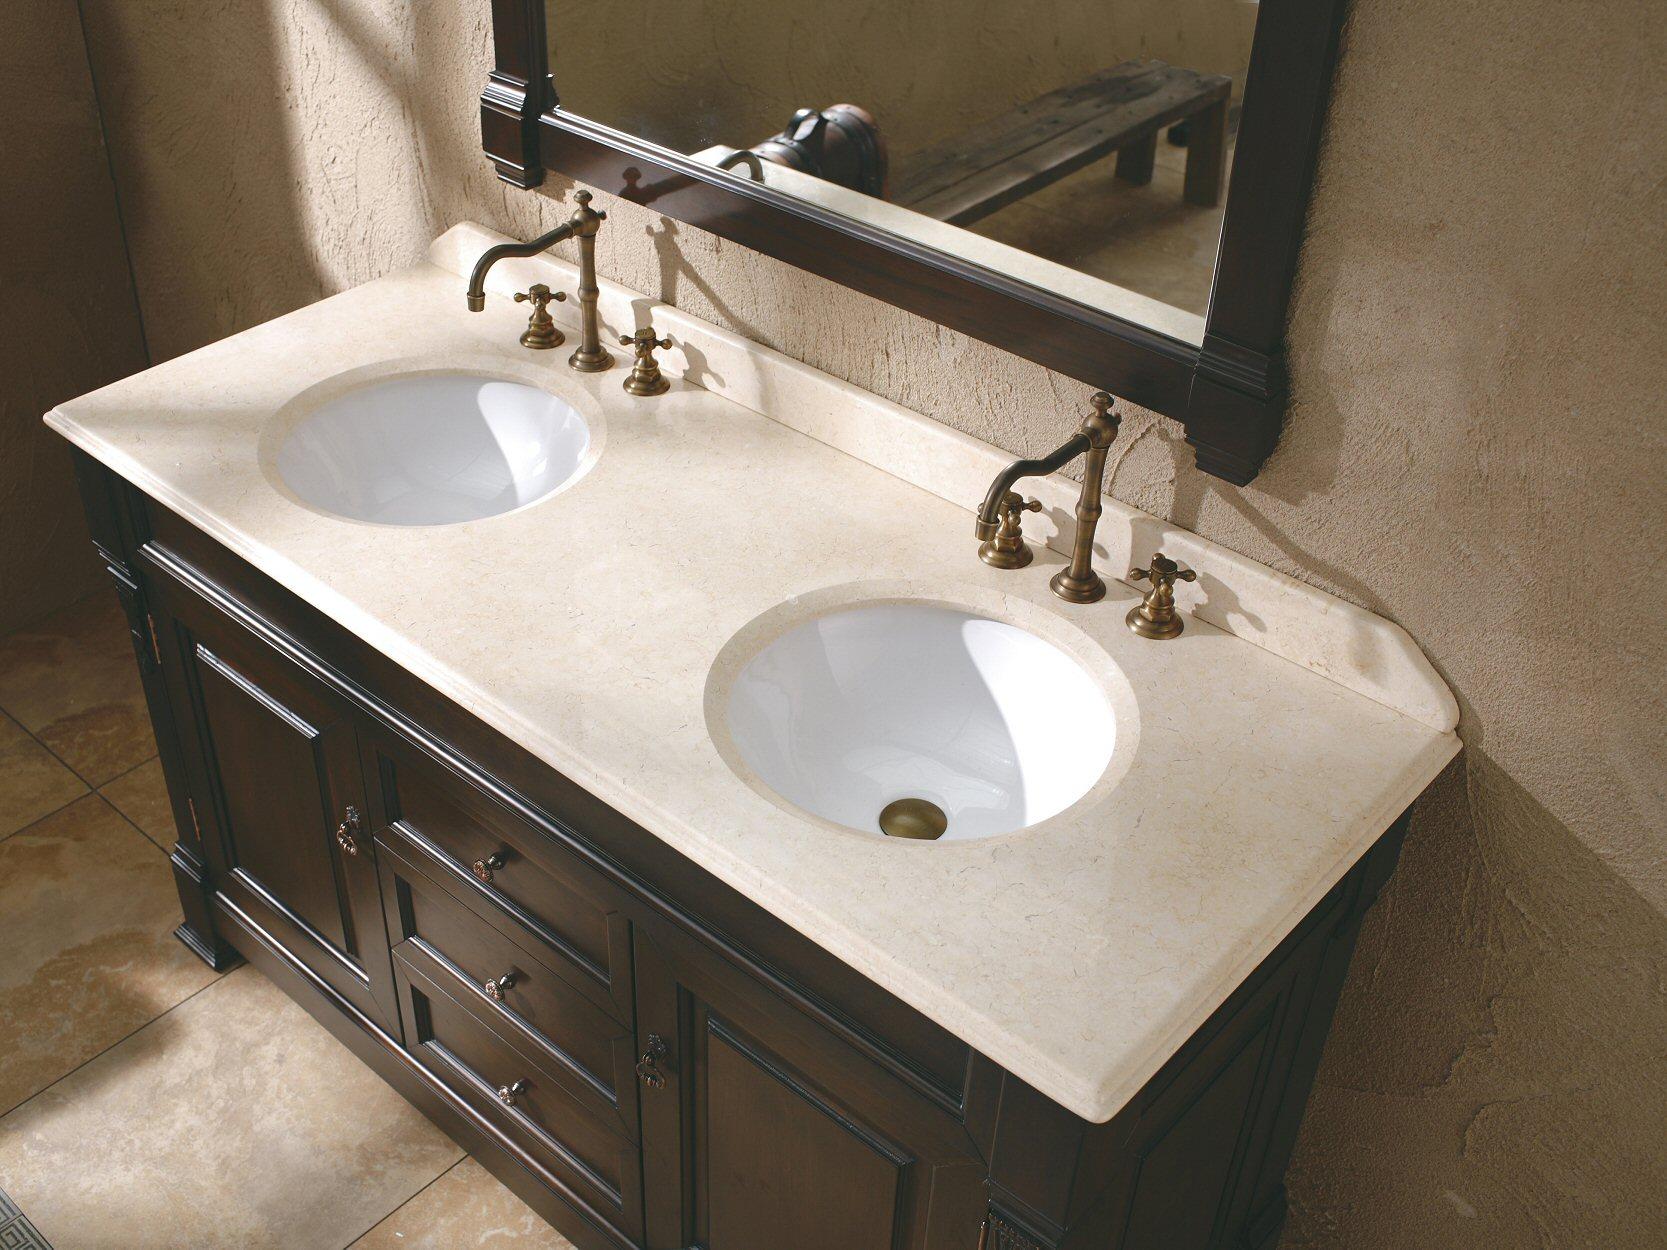 The 72 Ms 1072 Traditional Double Sink Bathroom Vanity